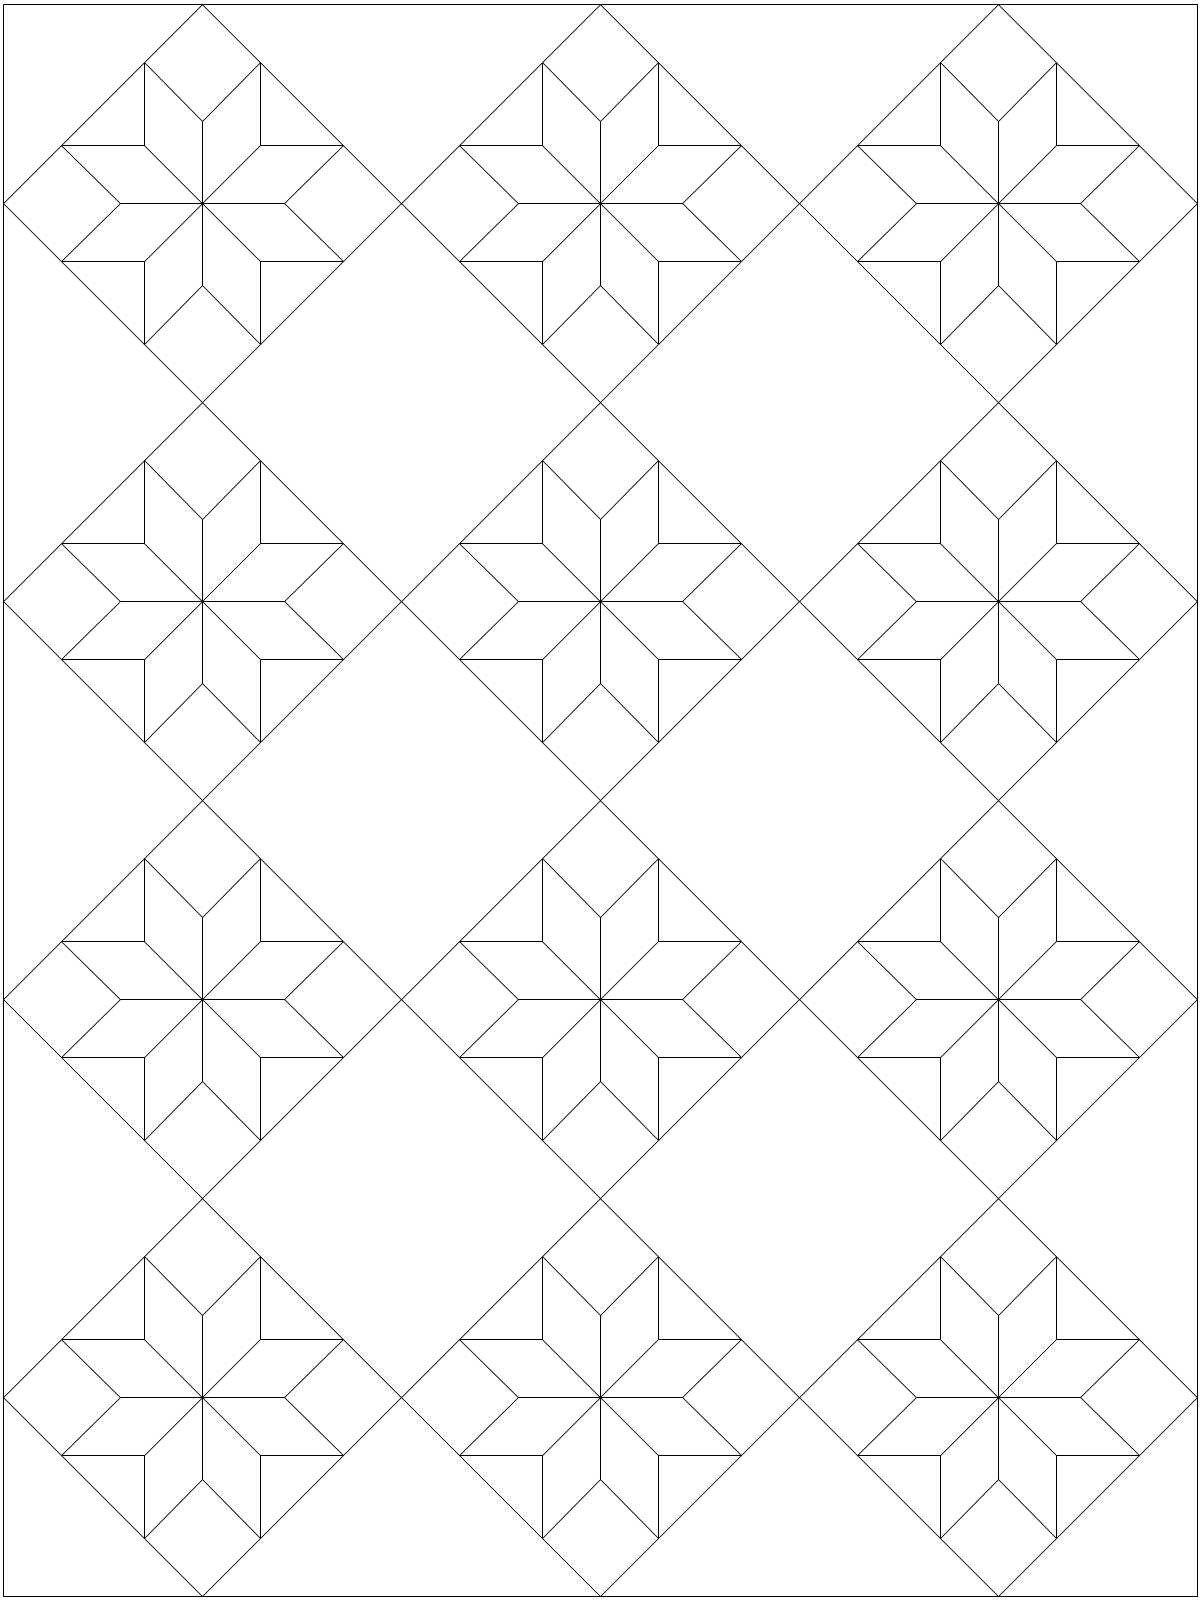 Lemoyne Star Template Lemoyne Star Quilt Pattern